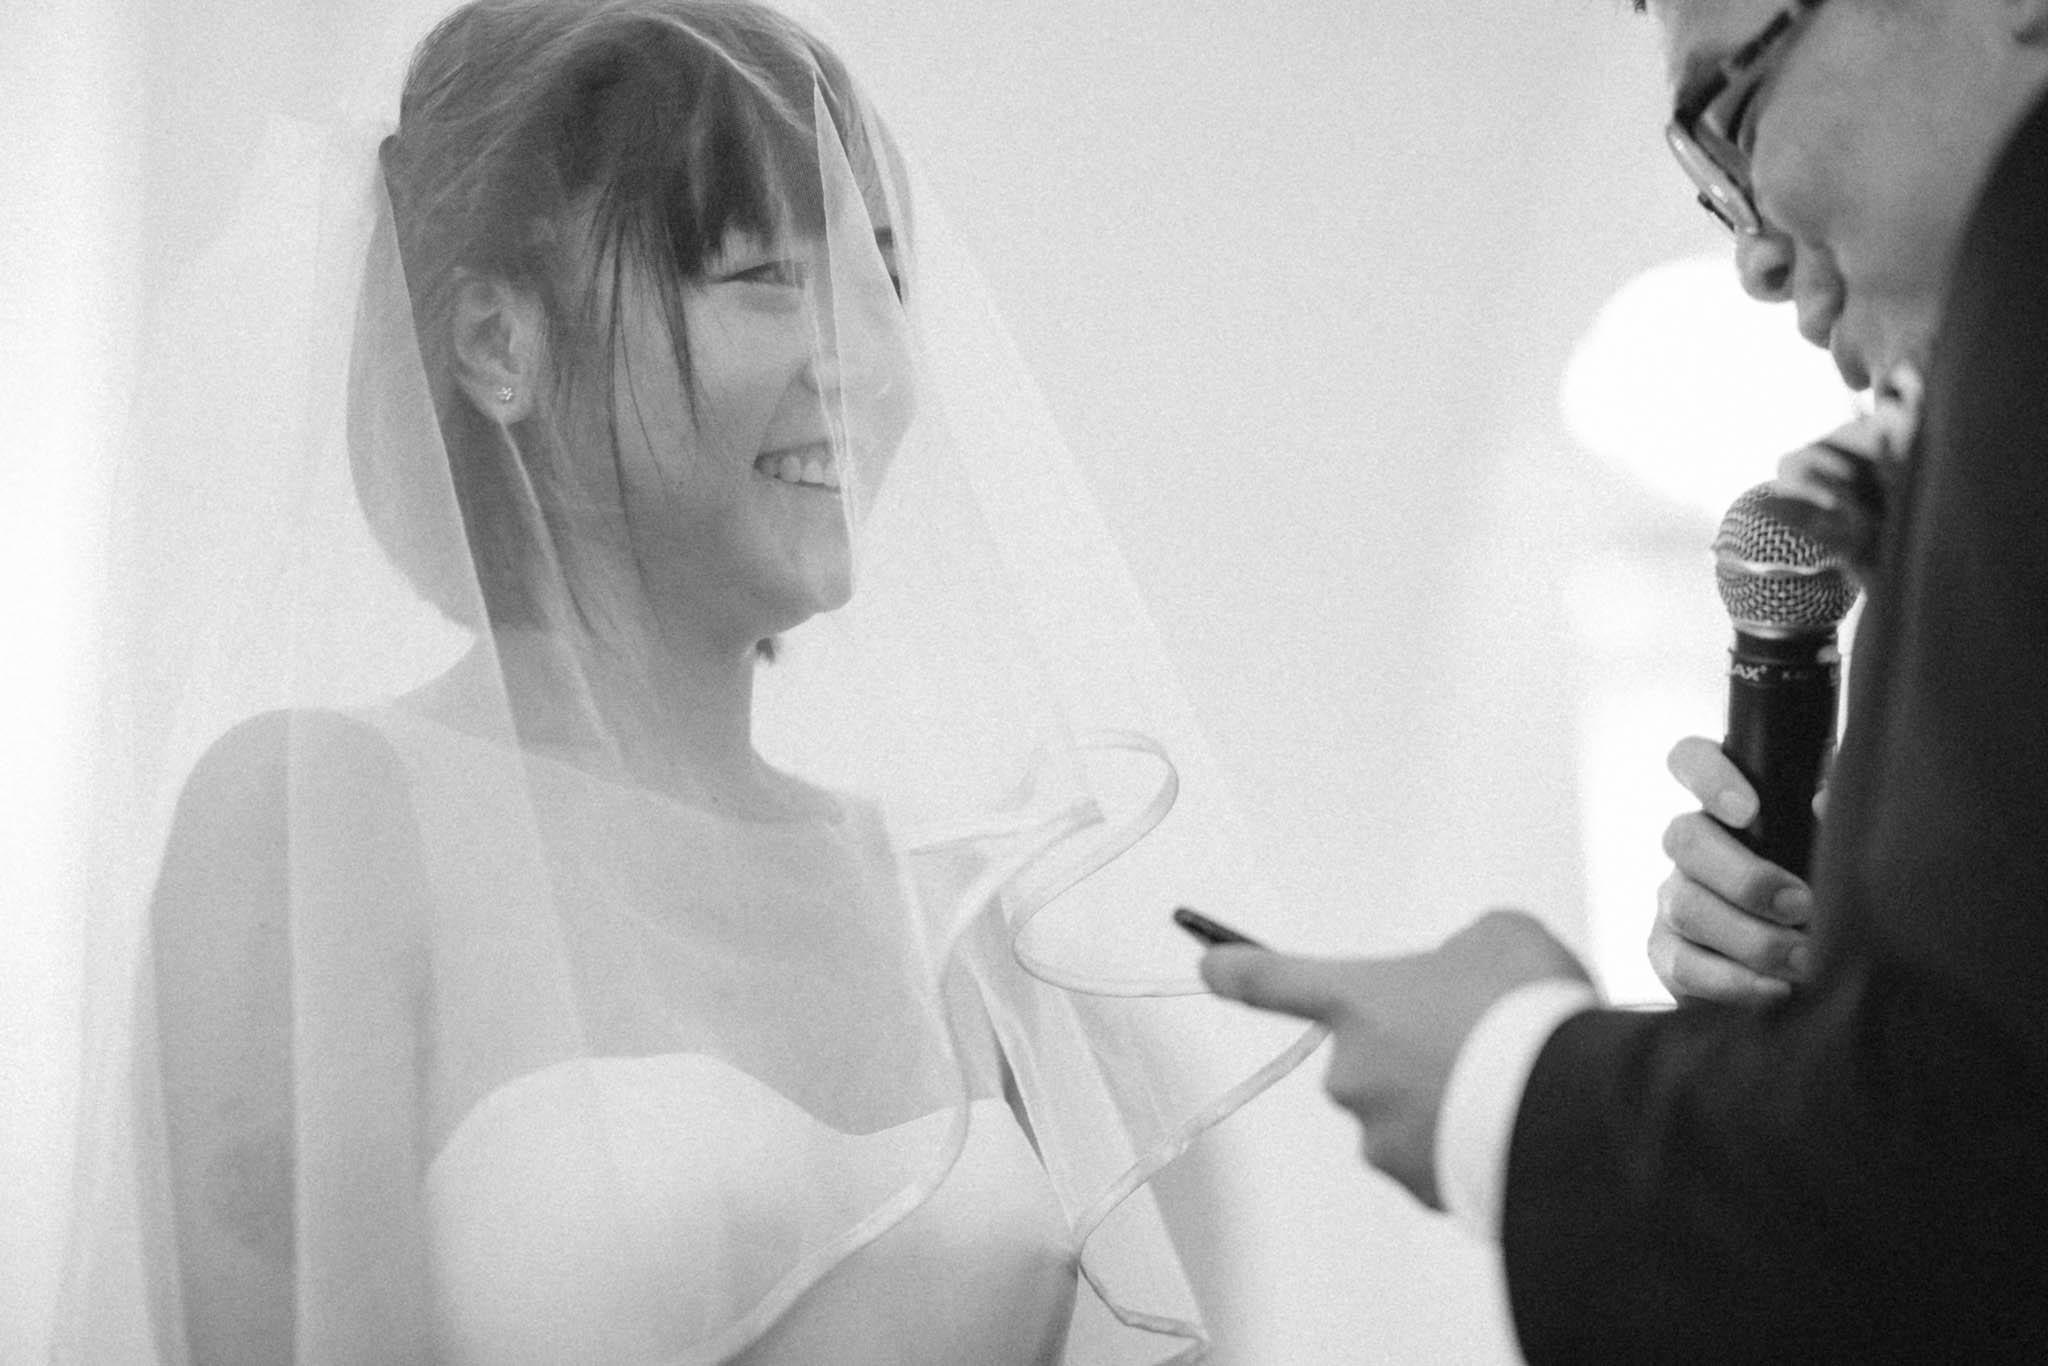 singapore-wedding-photographer-sentosa-foc-mark-eleanor-15.jpg